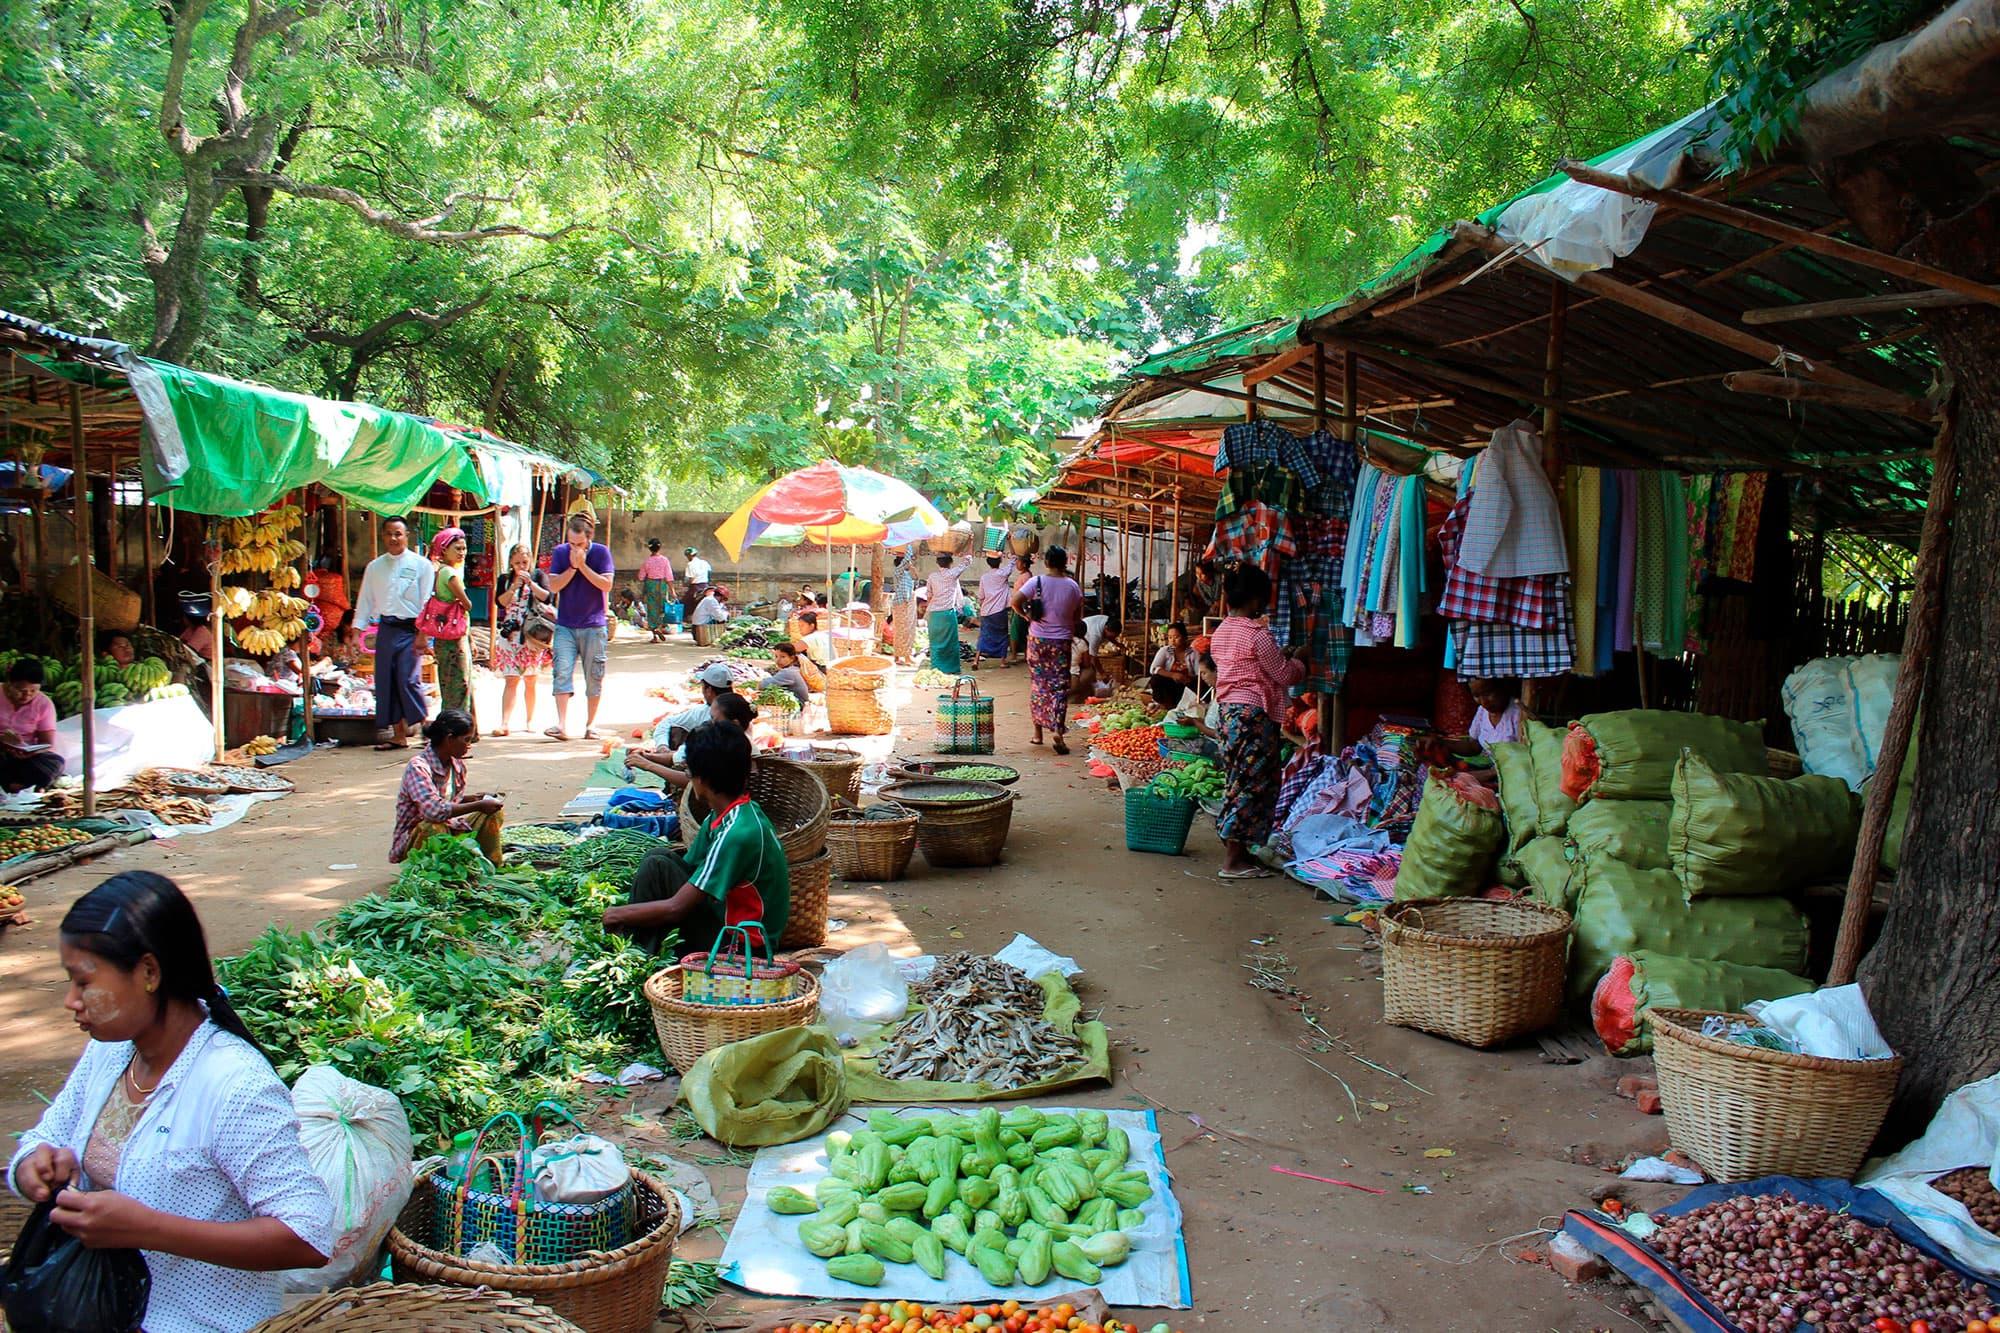 Myanmar espléndido, viaje de lujo - Myanmar- imagen #4